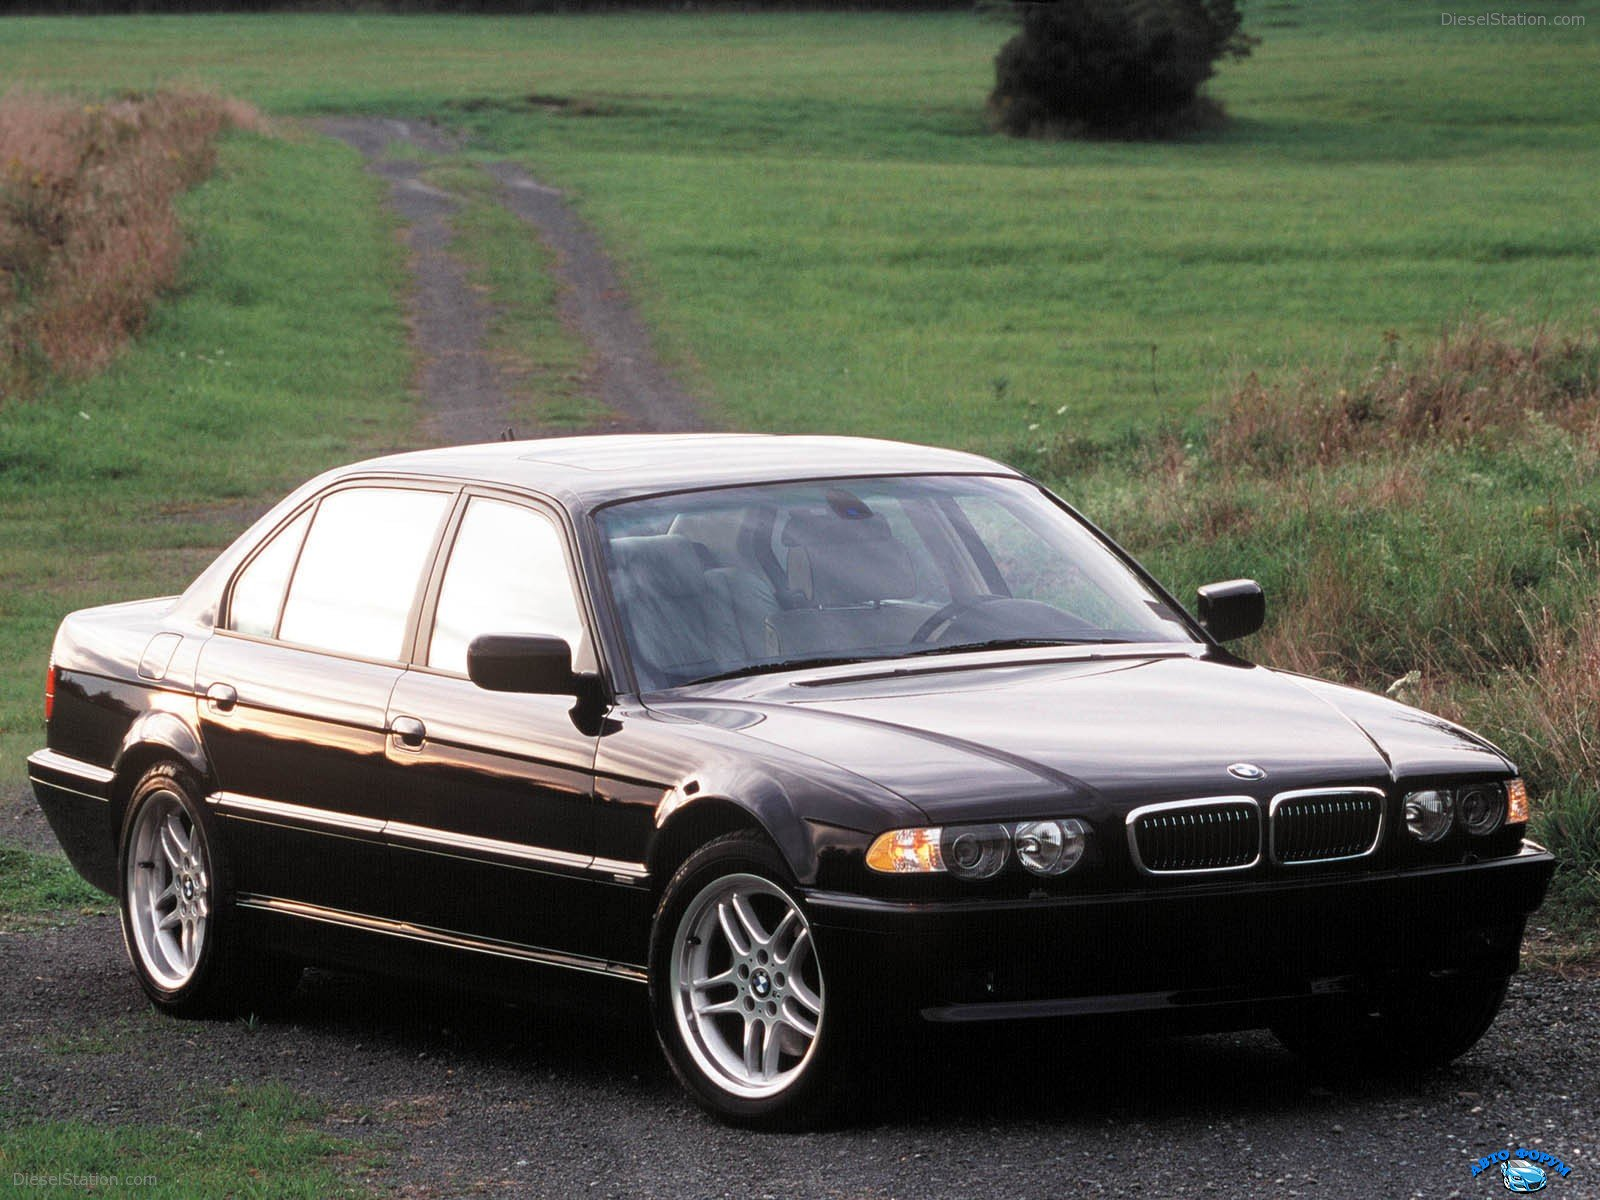 BMW-7Series-1994-018.jpg